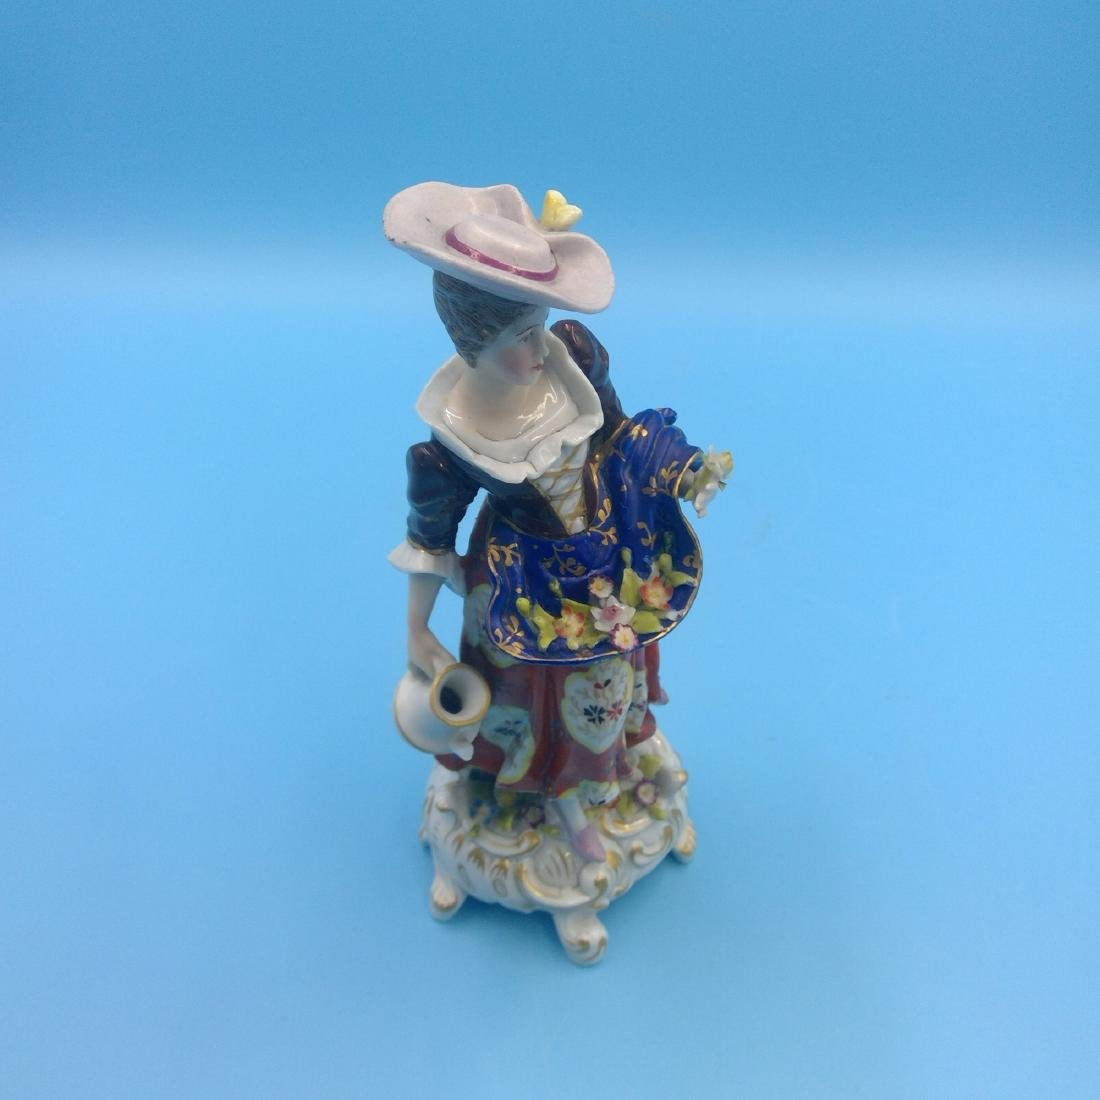 DERBY 18thC ENGLISH PORCELAIN FIGURINE LADY - 5